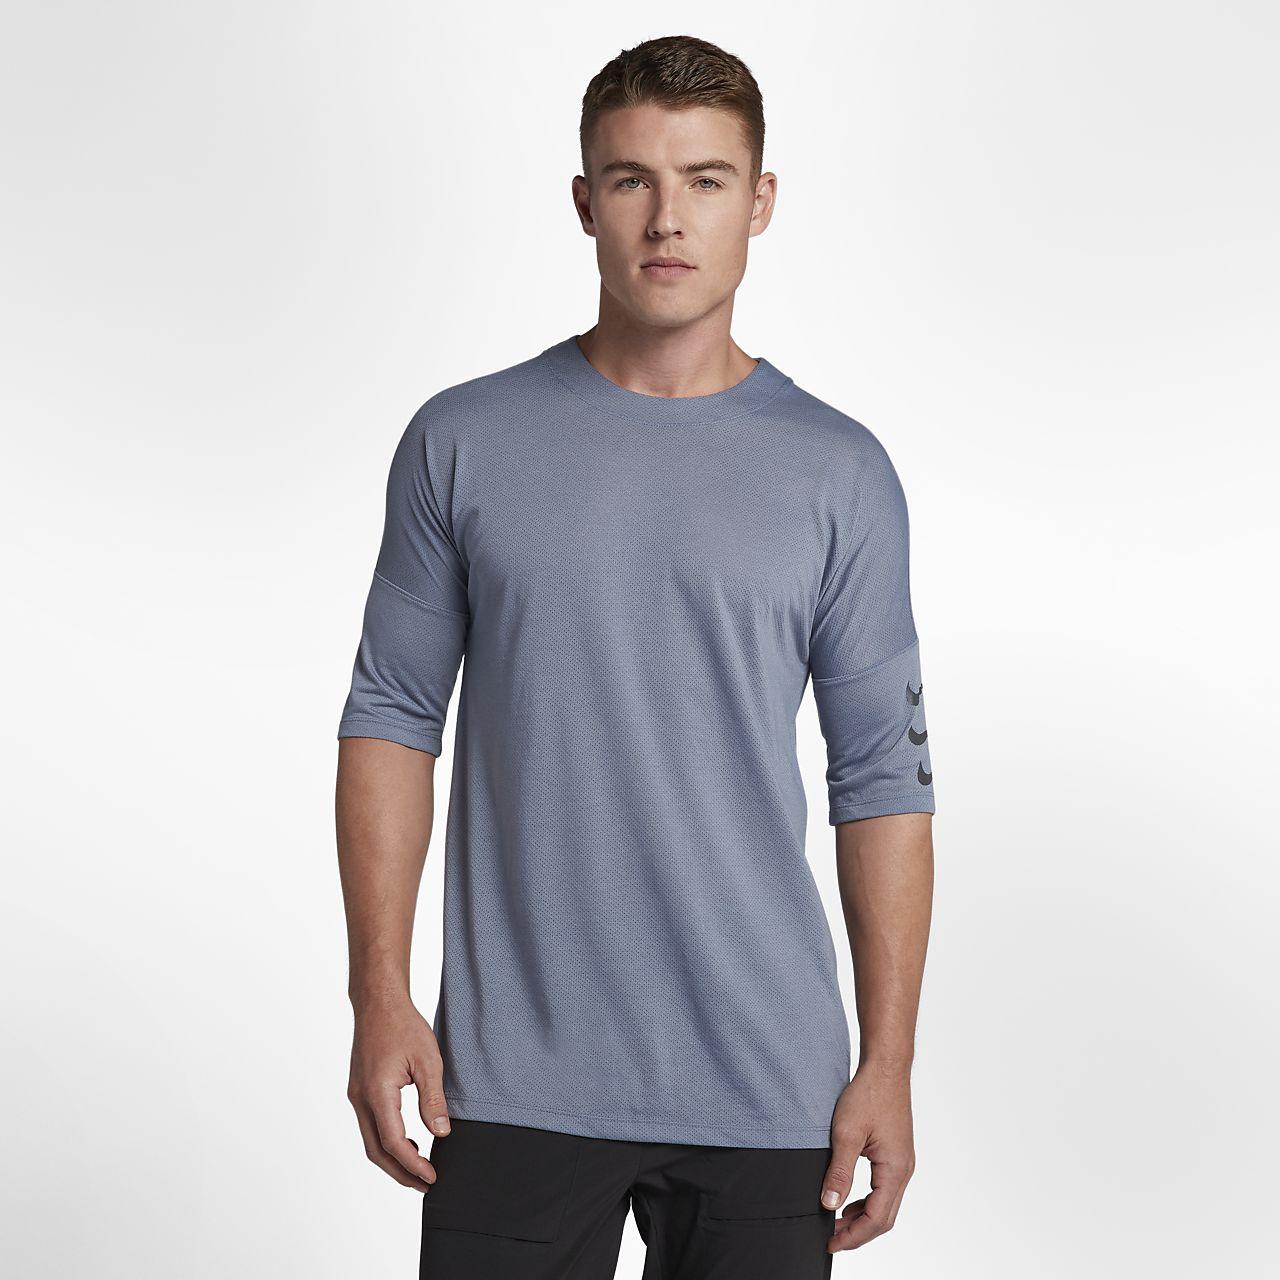 Nike Rise 365 男款五分袖跑步上衣